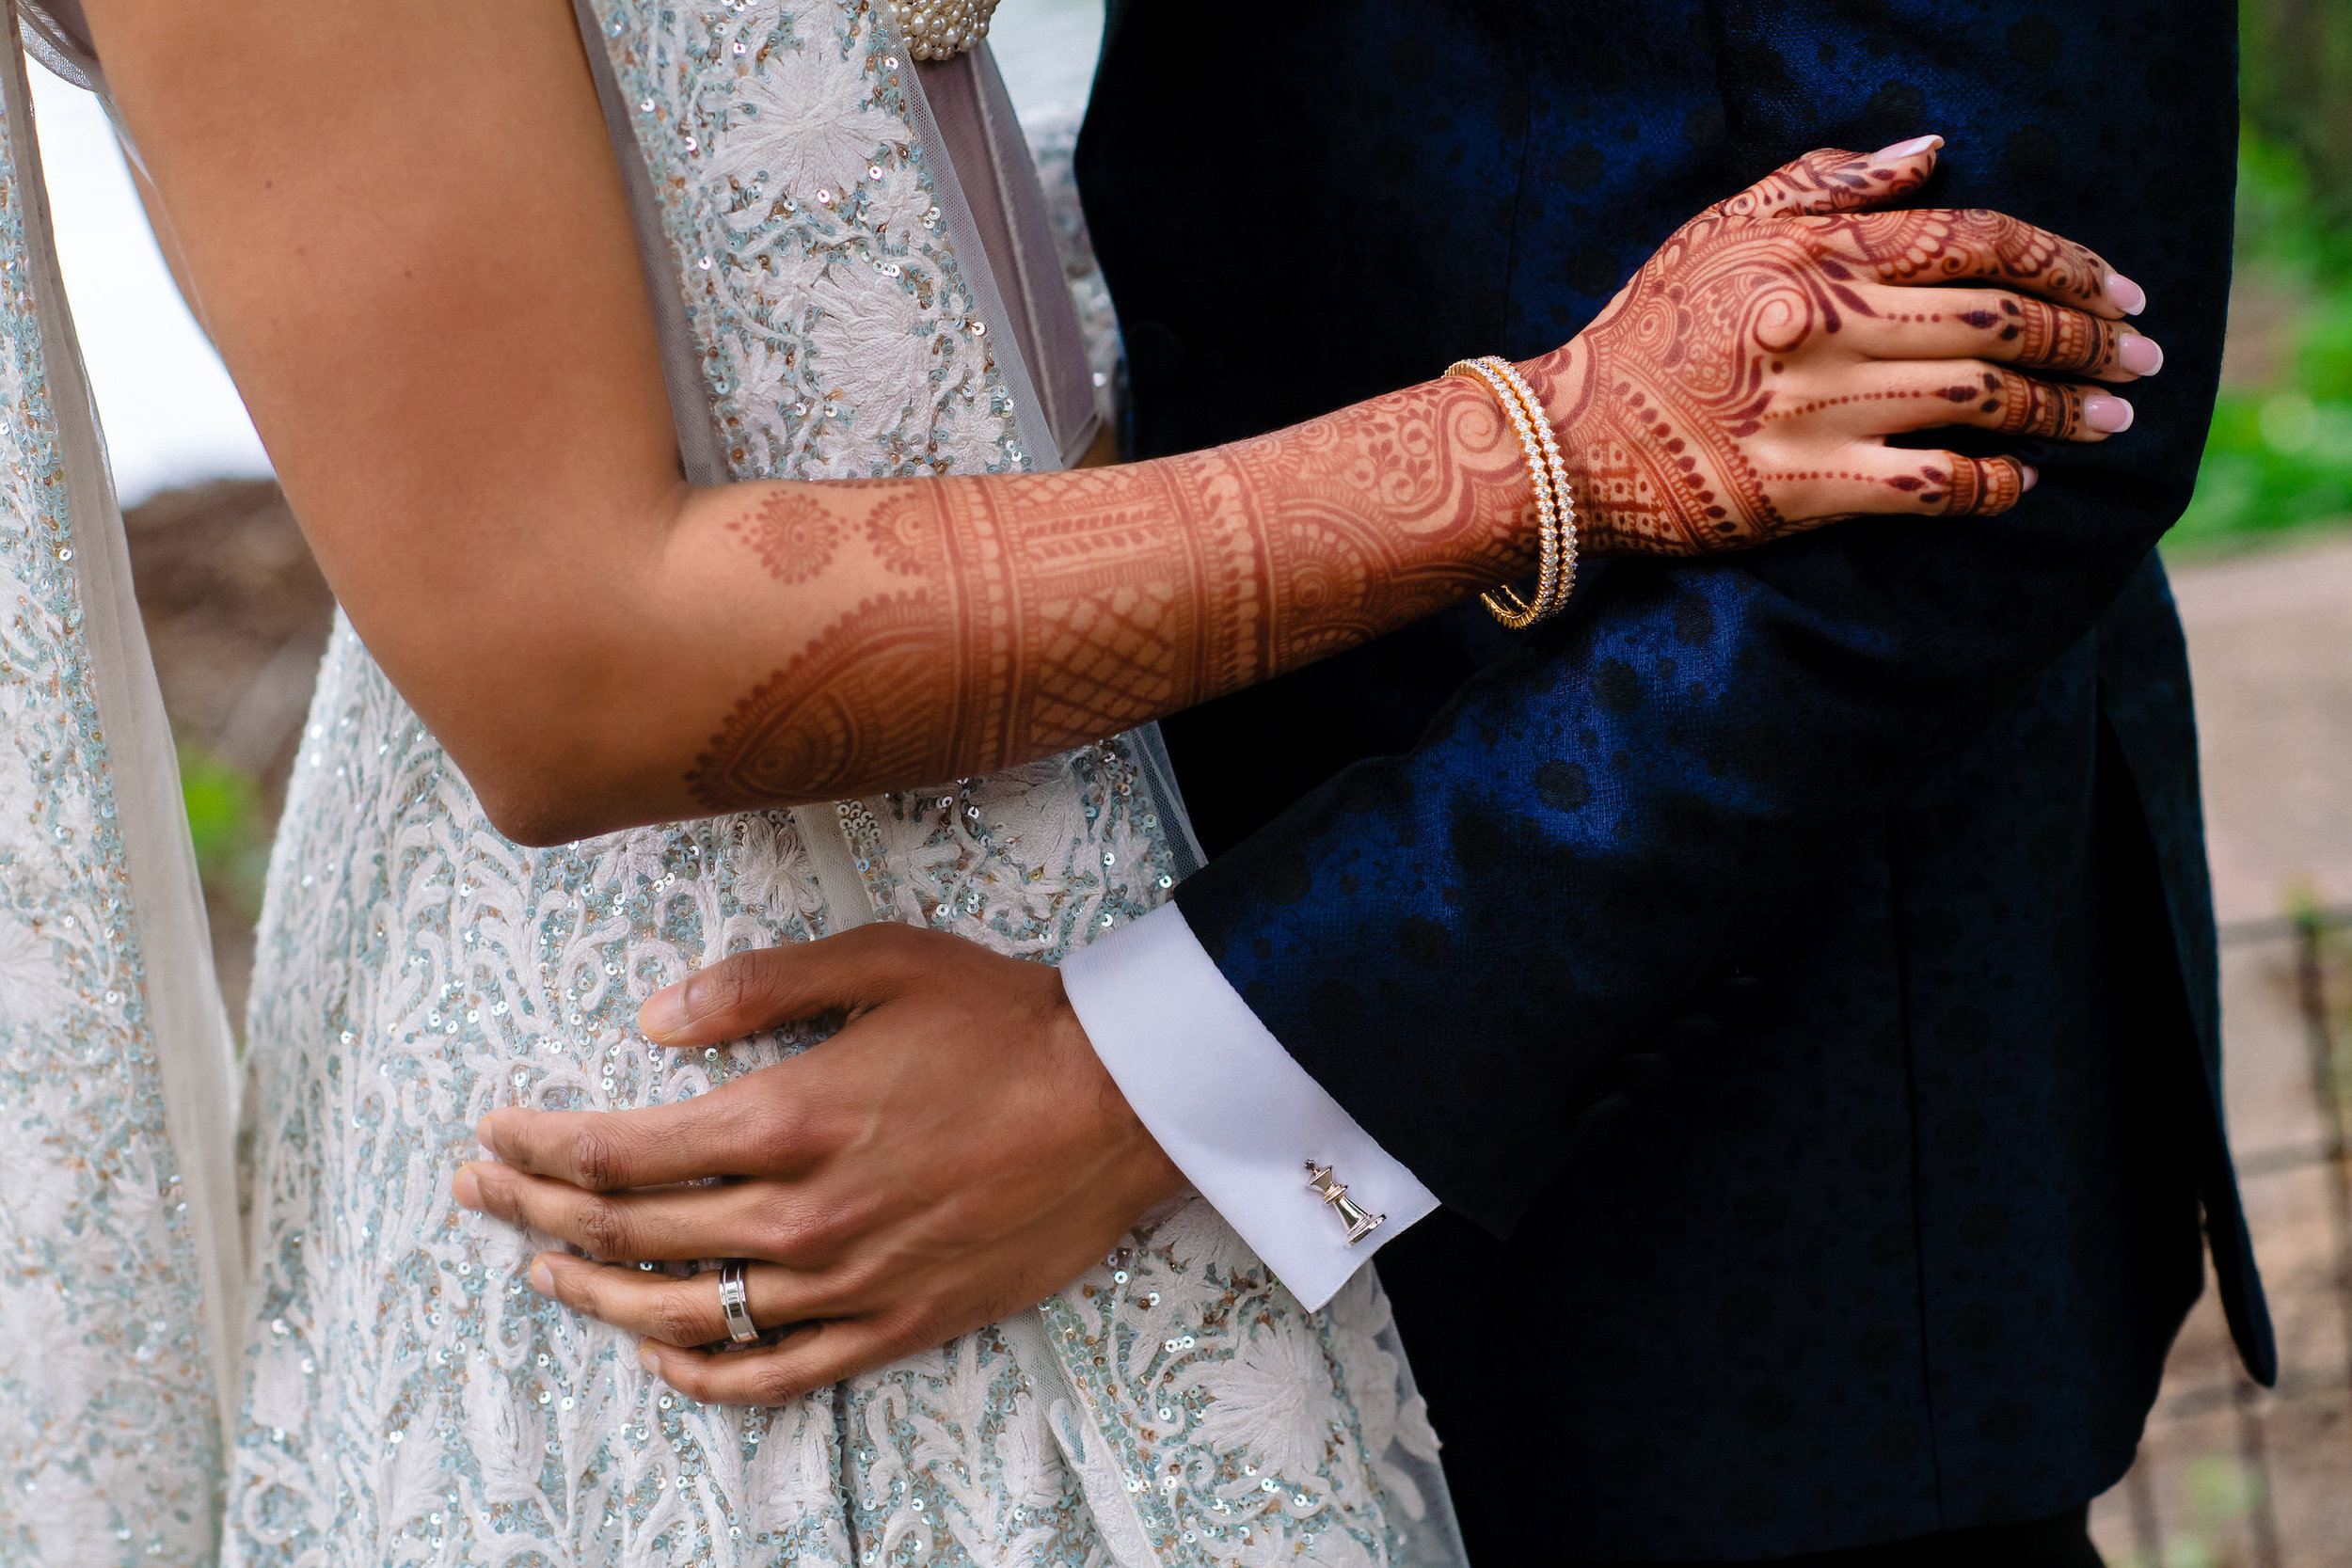 INDIAN WEDDING BRIDE AND GROOM HANDS CLOSEUP.JPG